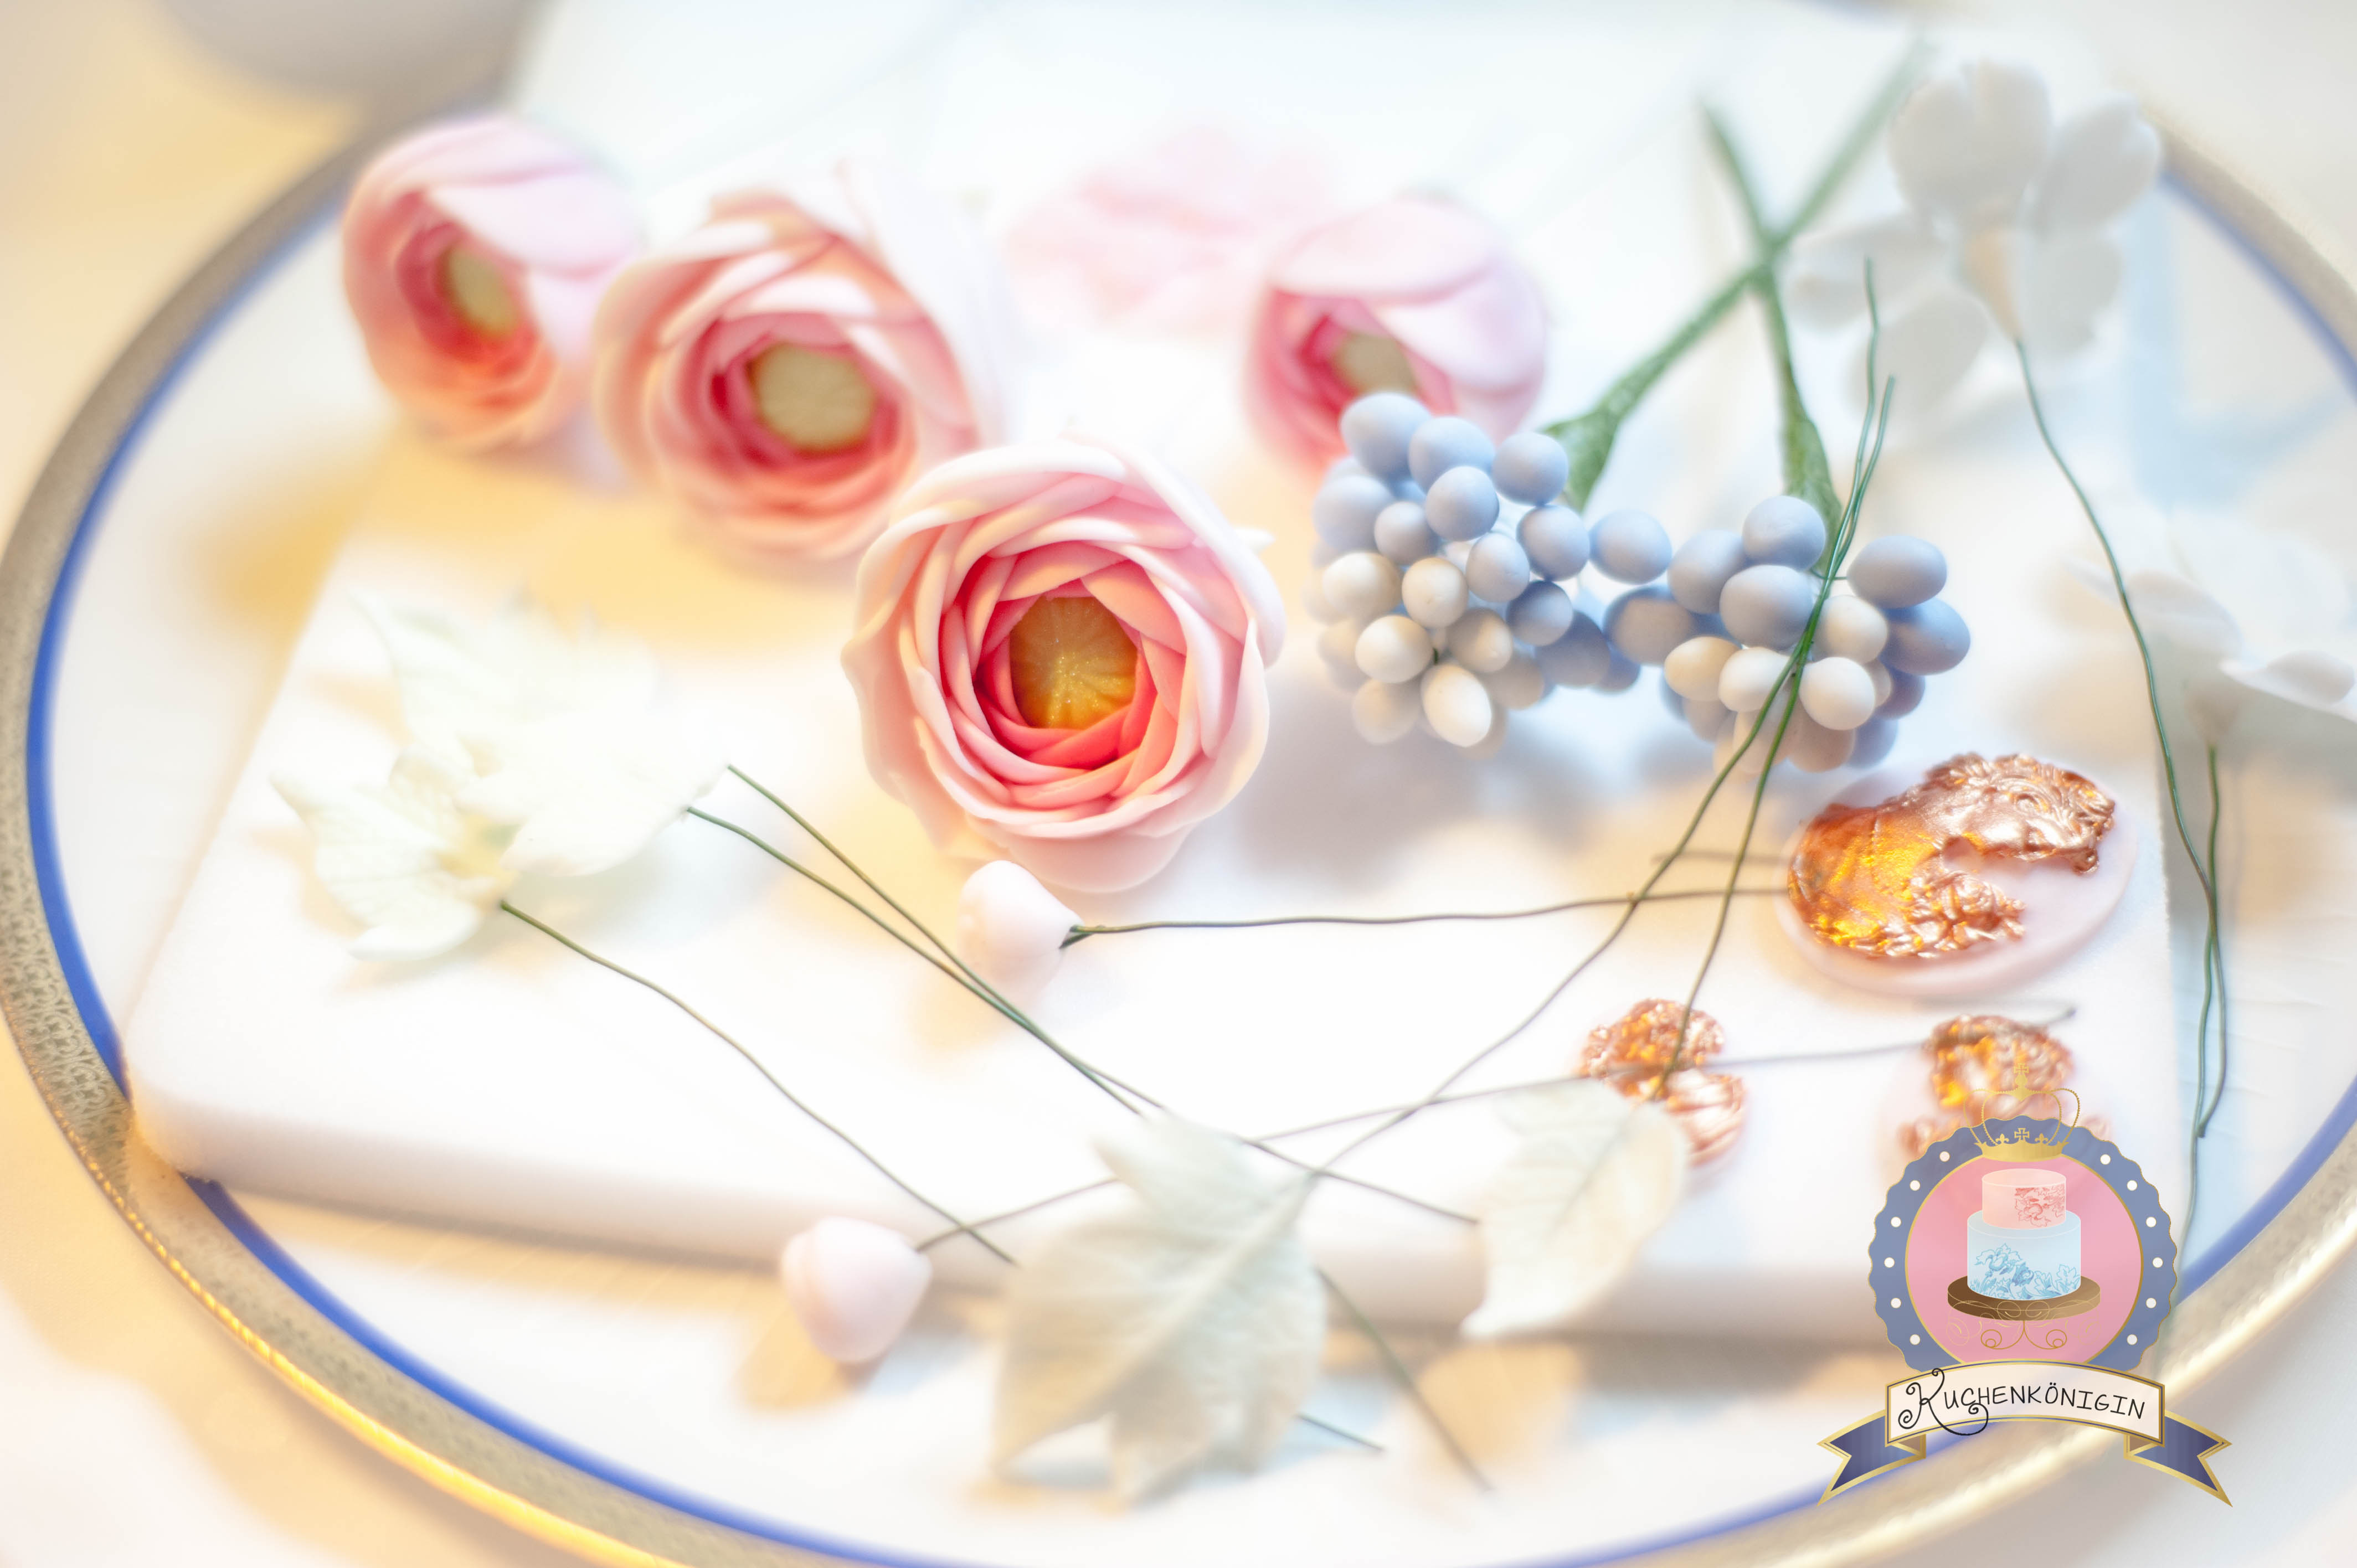 Kuchenkönigin Tutorial Vintage Frühlings Blüten Bouquet Zuckerblumen Zuckerblüten Fondant Gumpaste Blütenpaste Tutorial Rezept